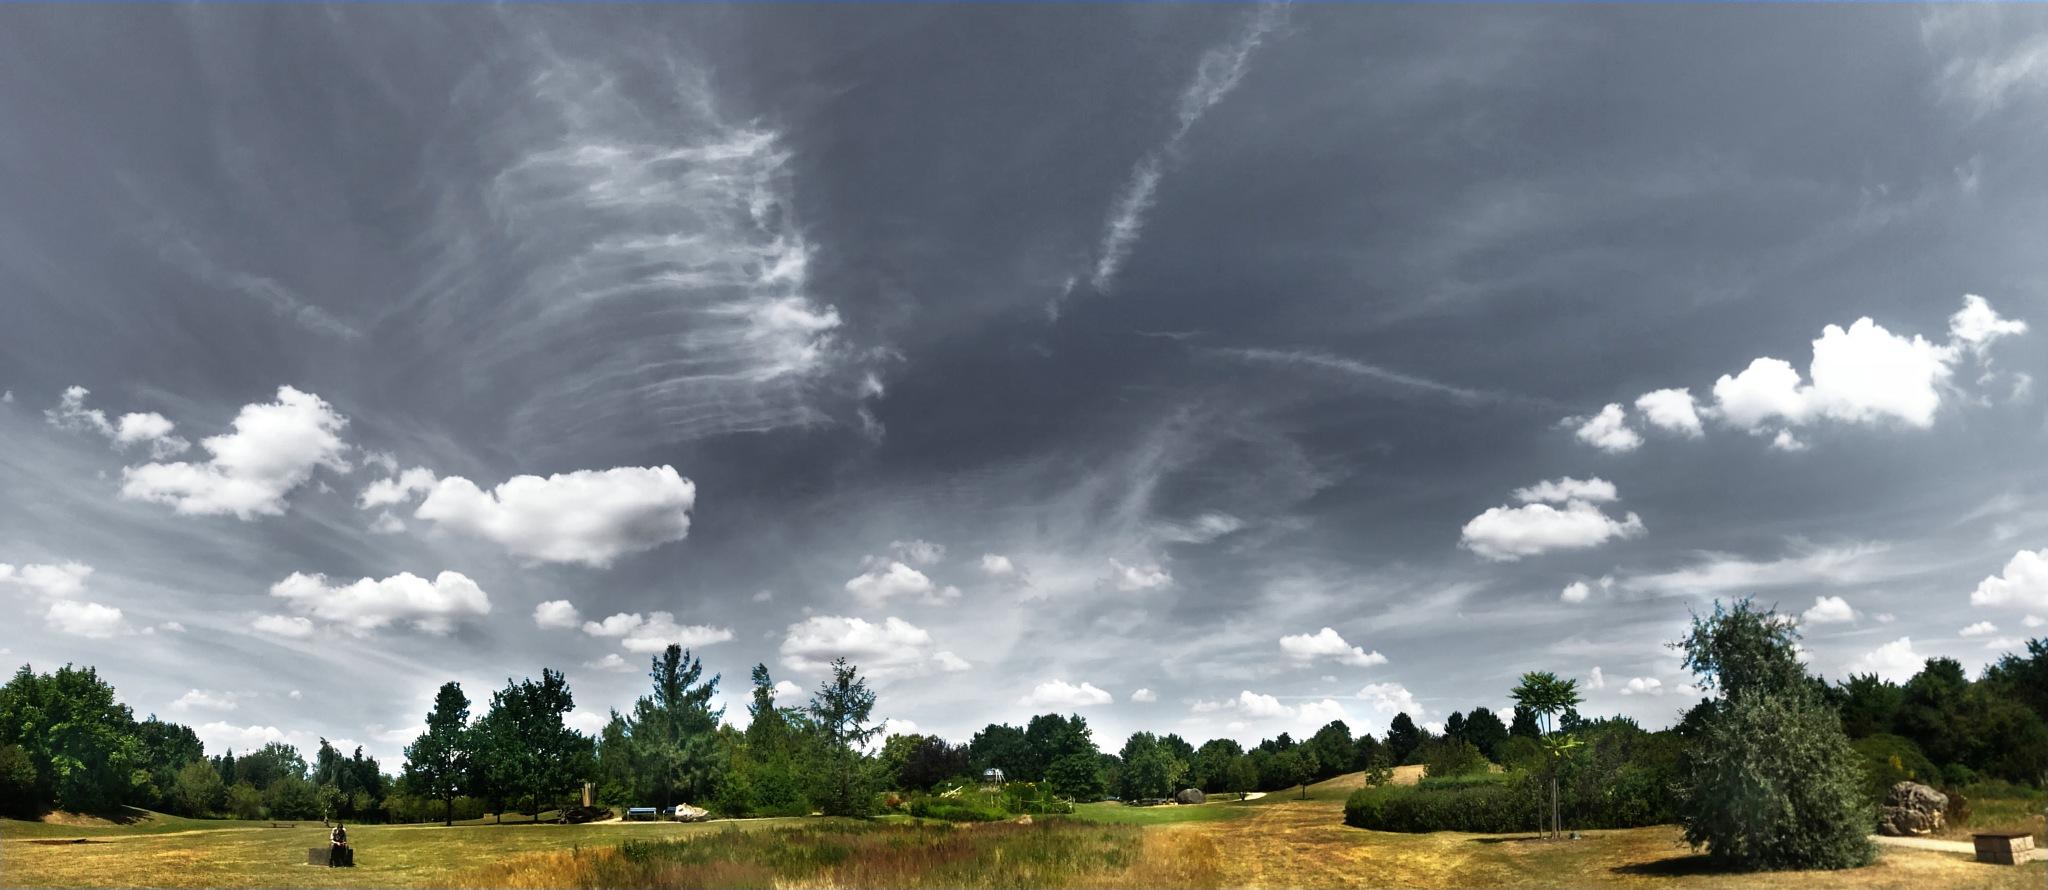 Heaven over Park by Frank Brandes